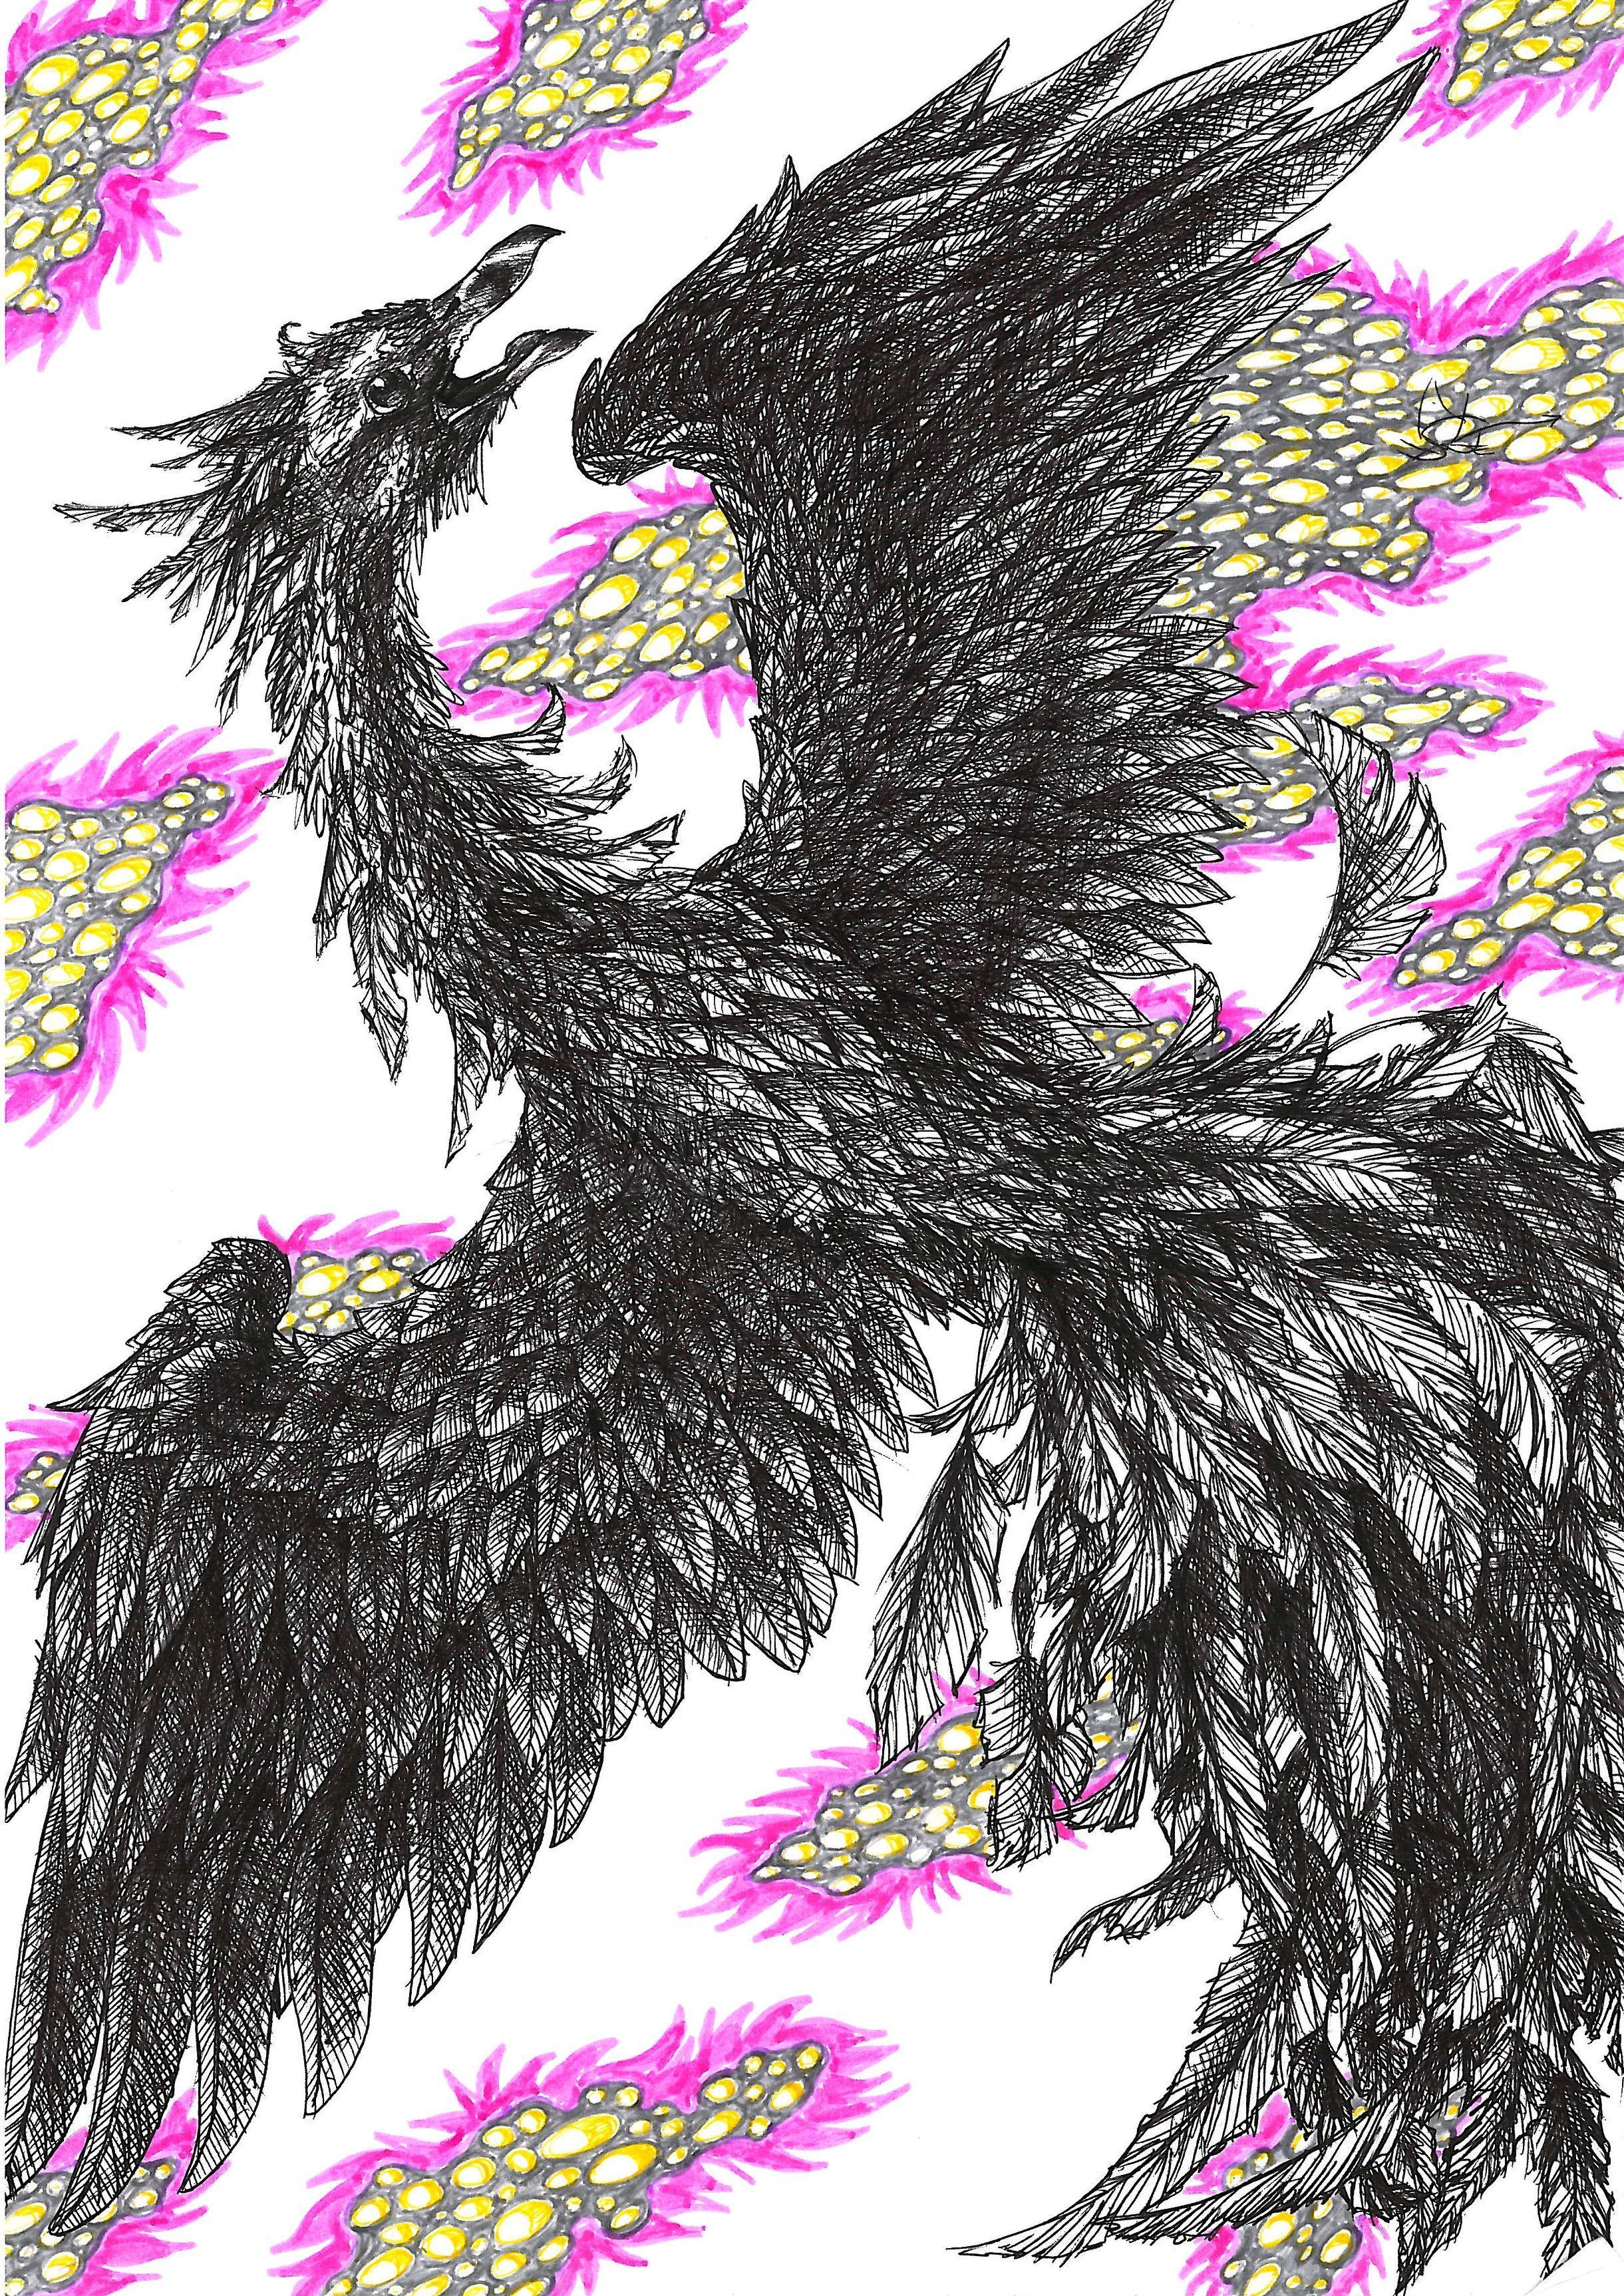 [RYSUNKI]- czyli mini Deviant Saf - Page 6 Phoenix_by_fandragonball-d9rmvah